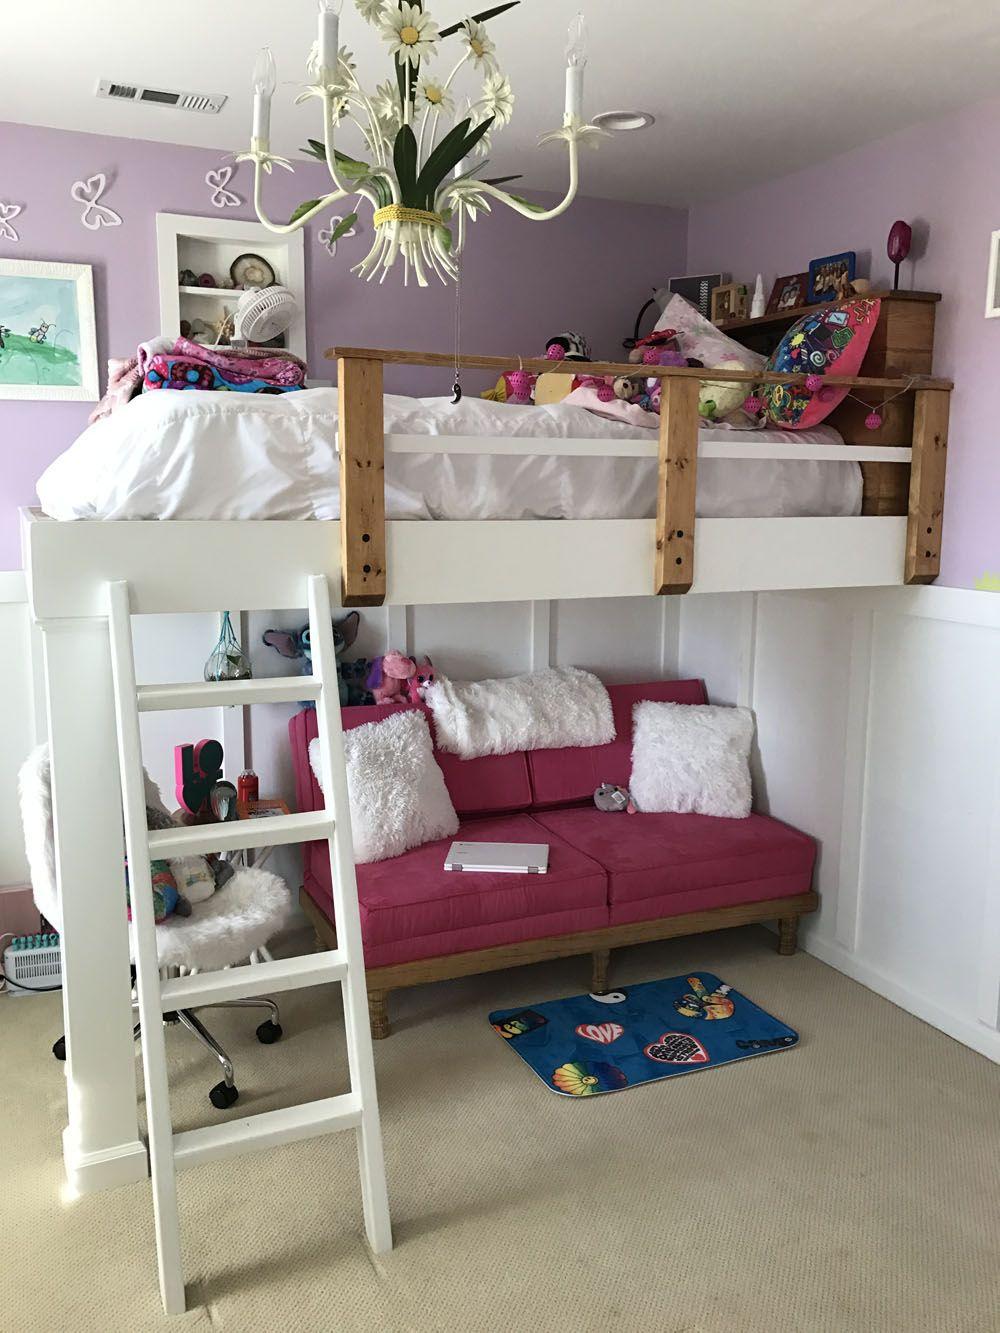 Ana White Kids Loft Bed Diy Projects Diy Loft Bed Kids Loft Beds Loft Beds For Teens